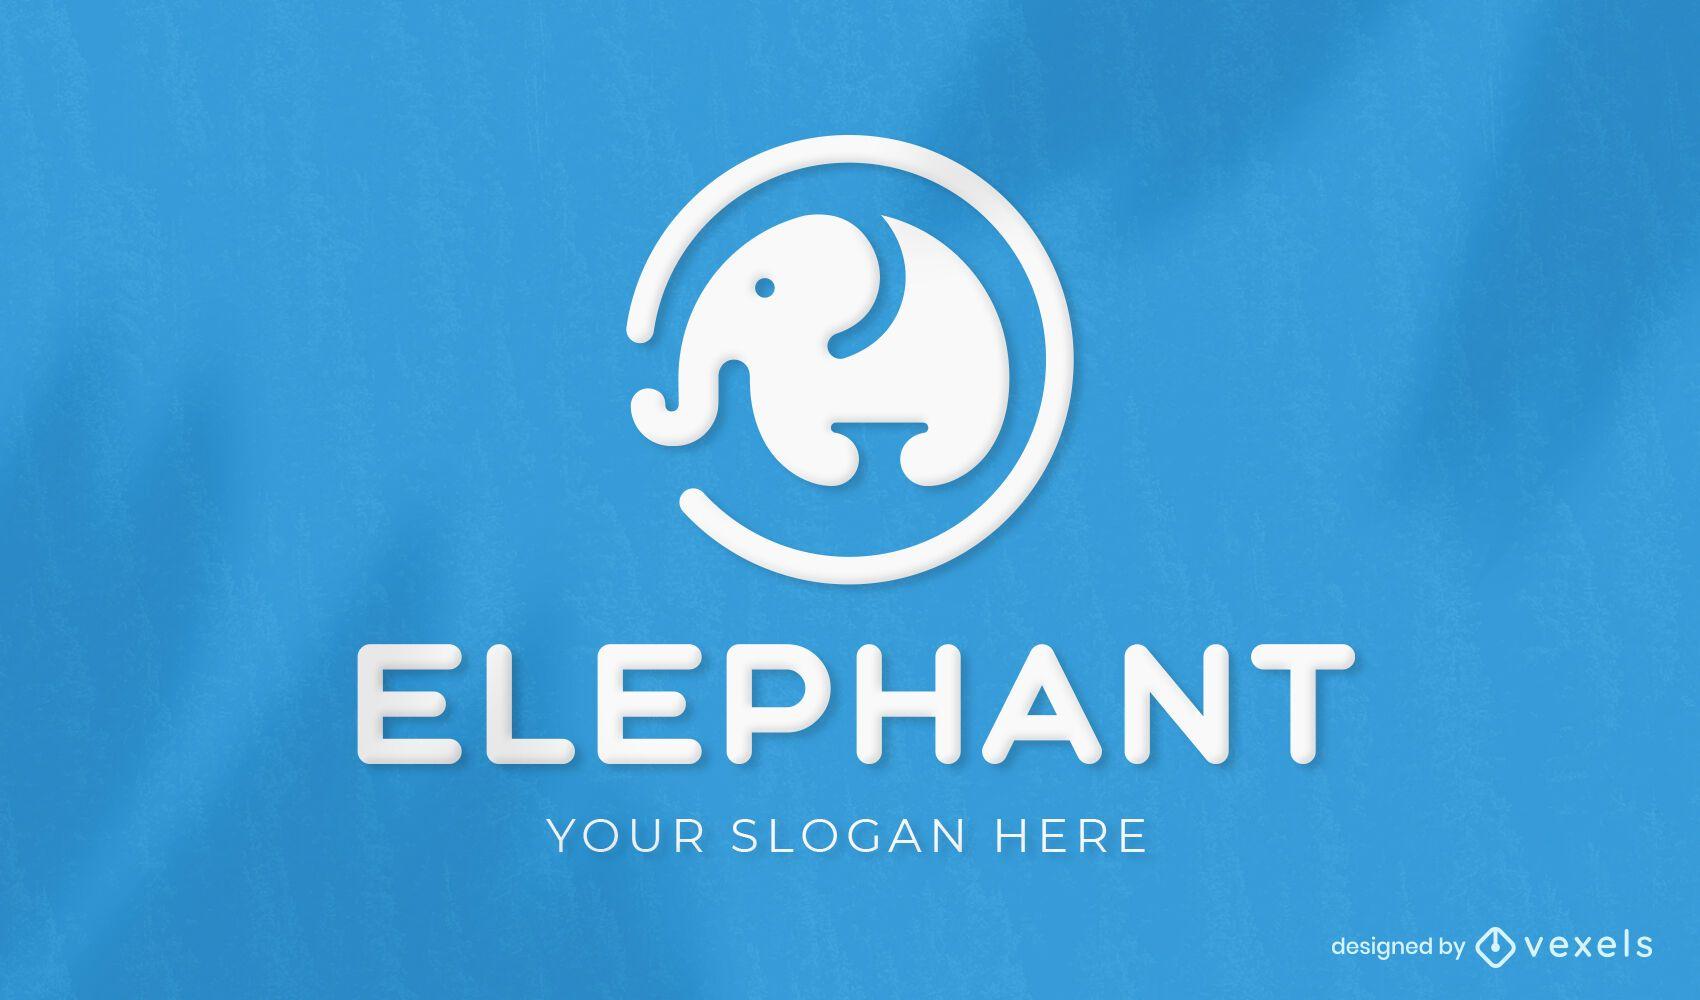 Elephant animal cut out logo design